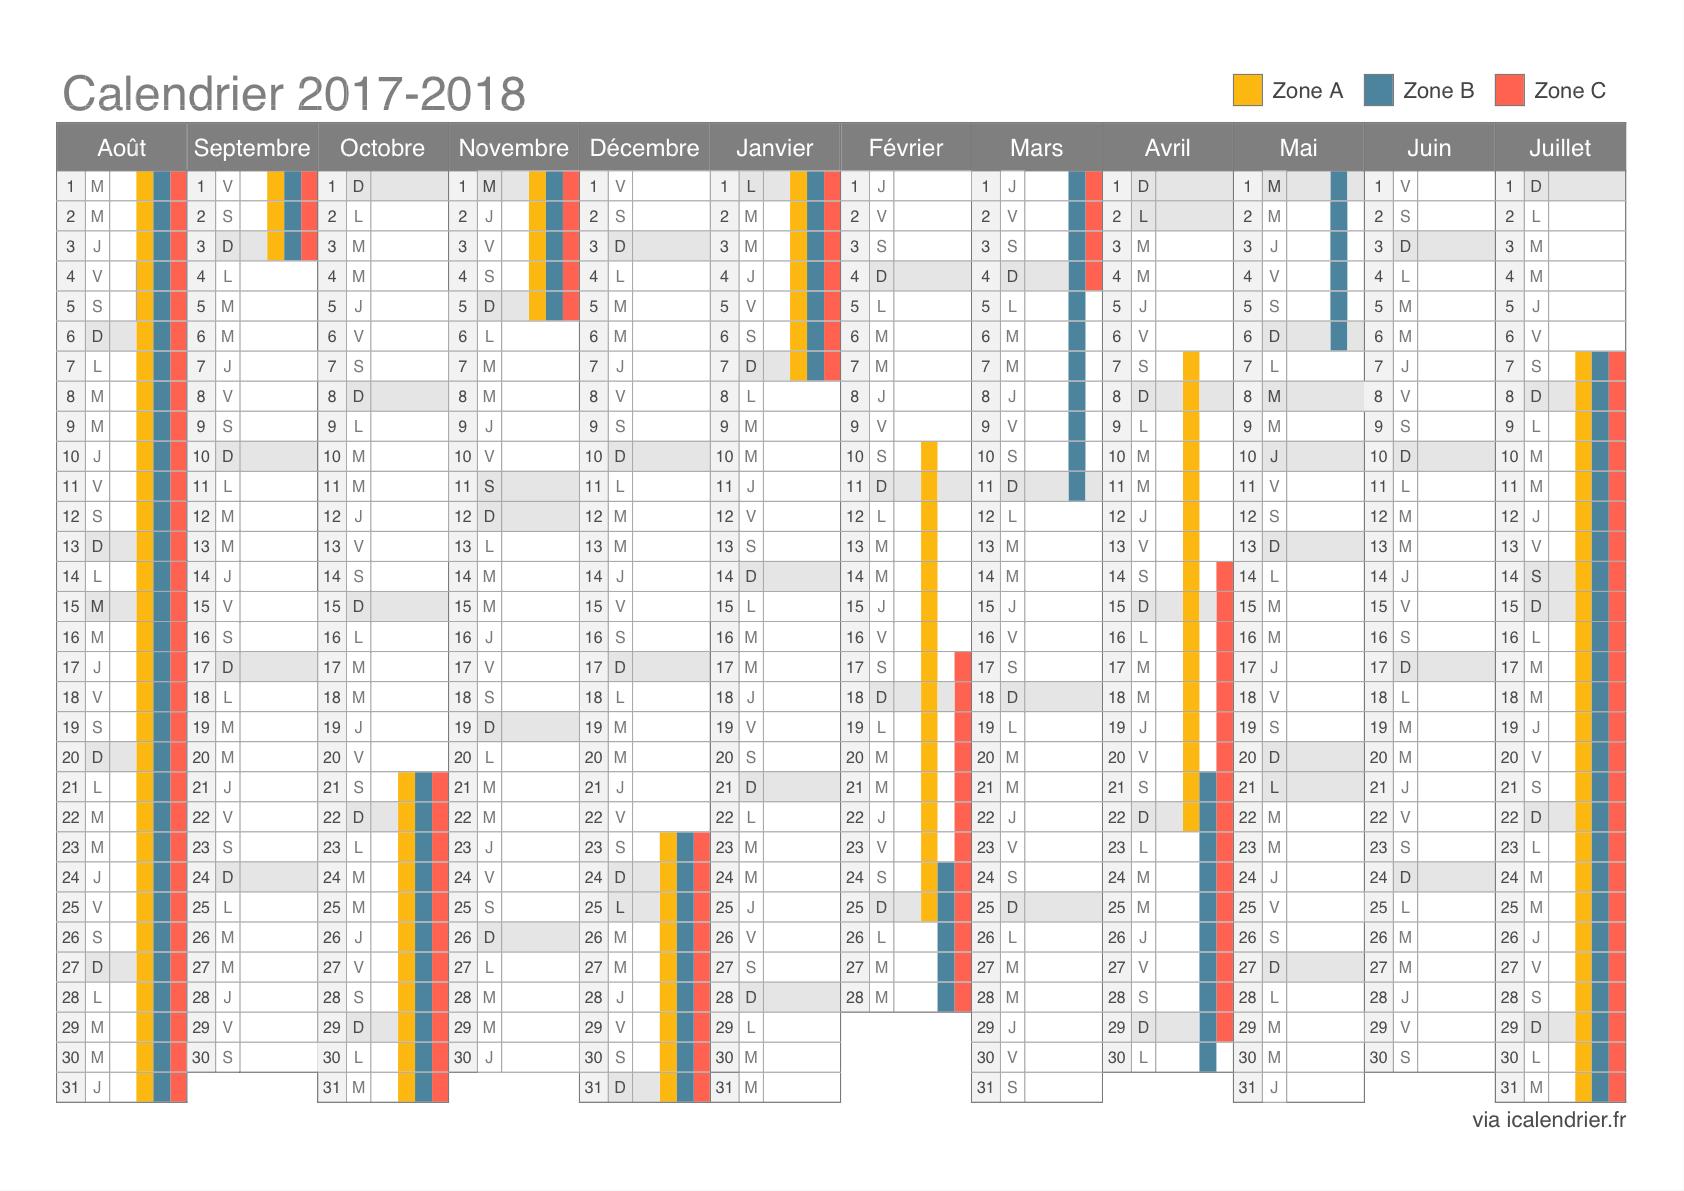 Calendrier scolaire 2018-2018